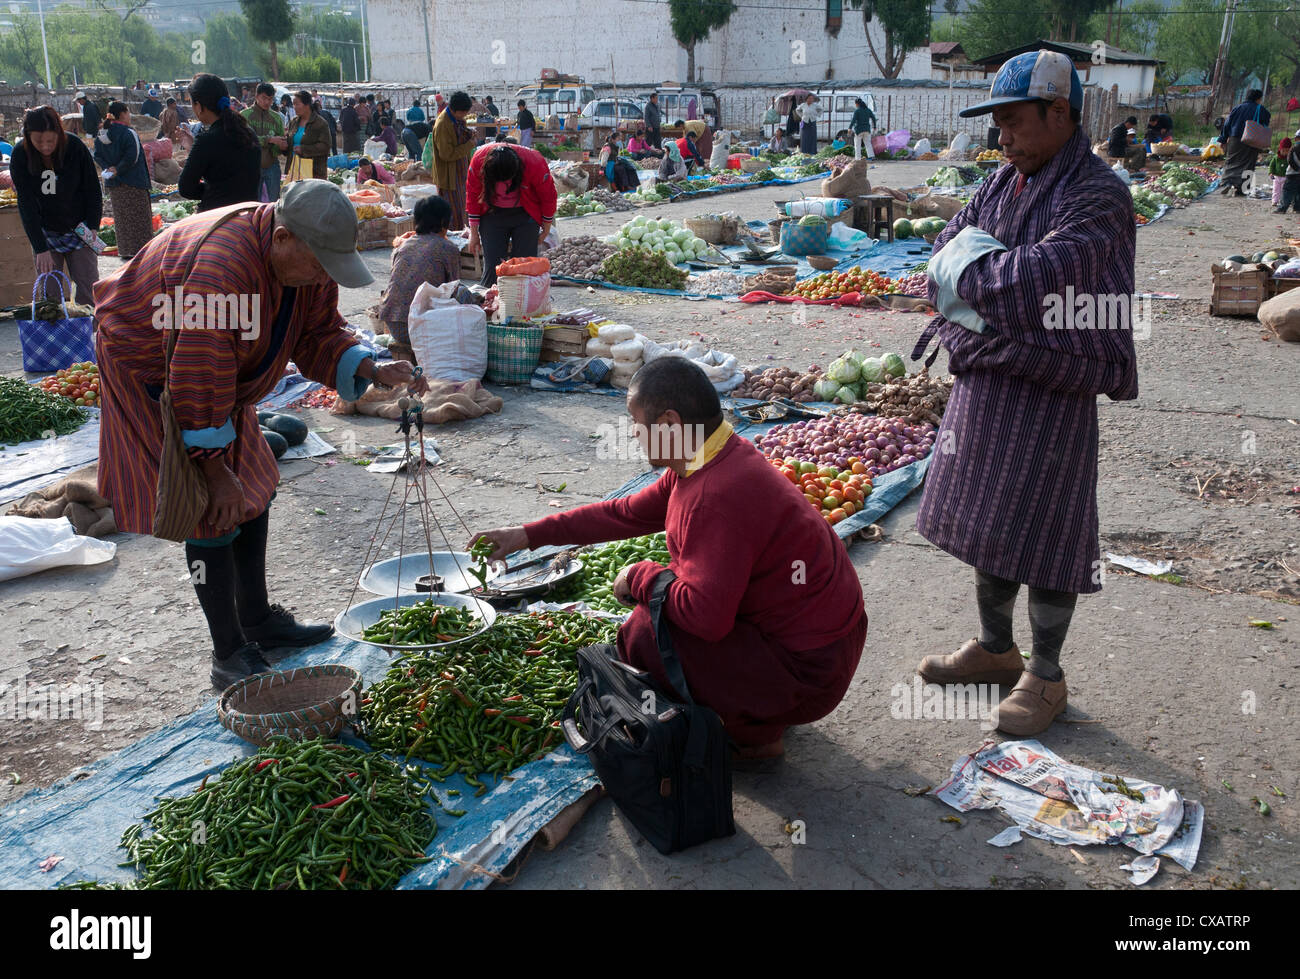 Weekly Sunday food market. Paro, Bhutan, Asia - Stock Image